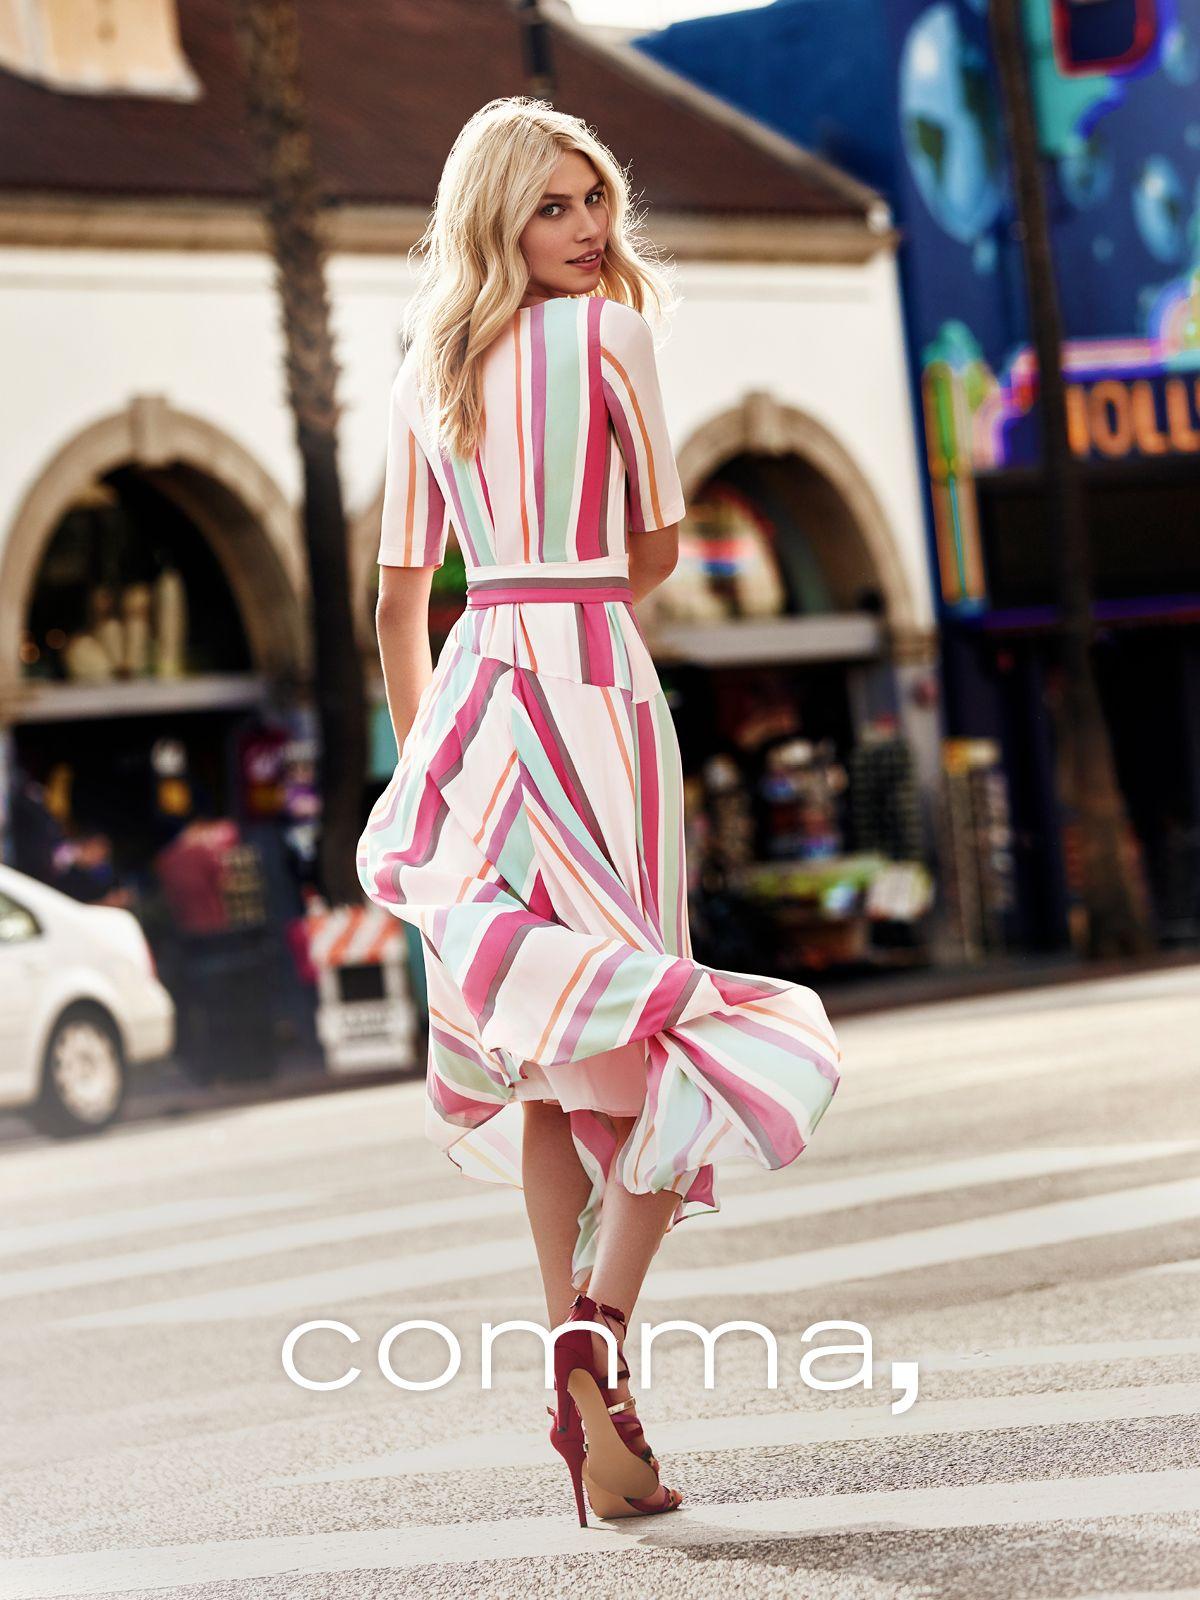 Comma Fashion Spring Summer 2019 Comma In L A Commafashion Modestil Coole Kleider Kleider